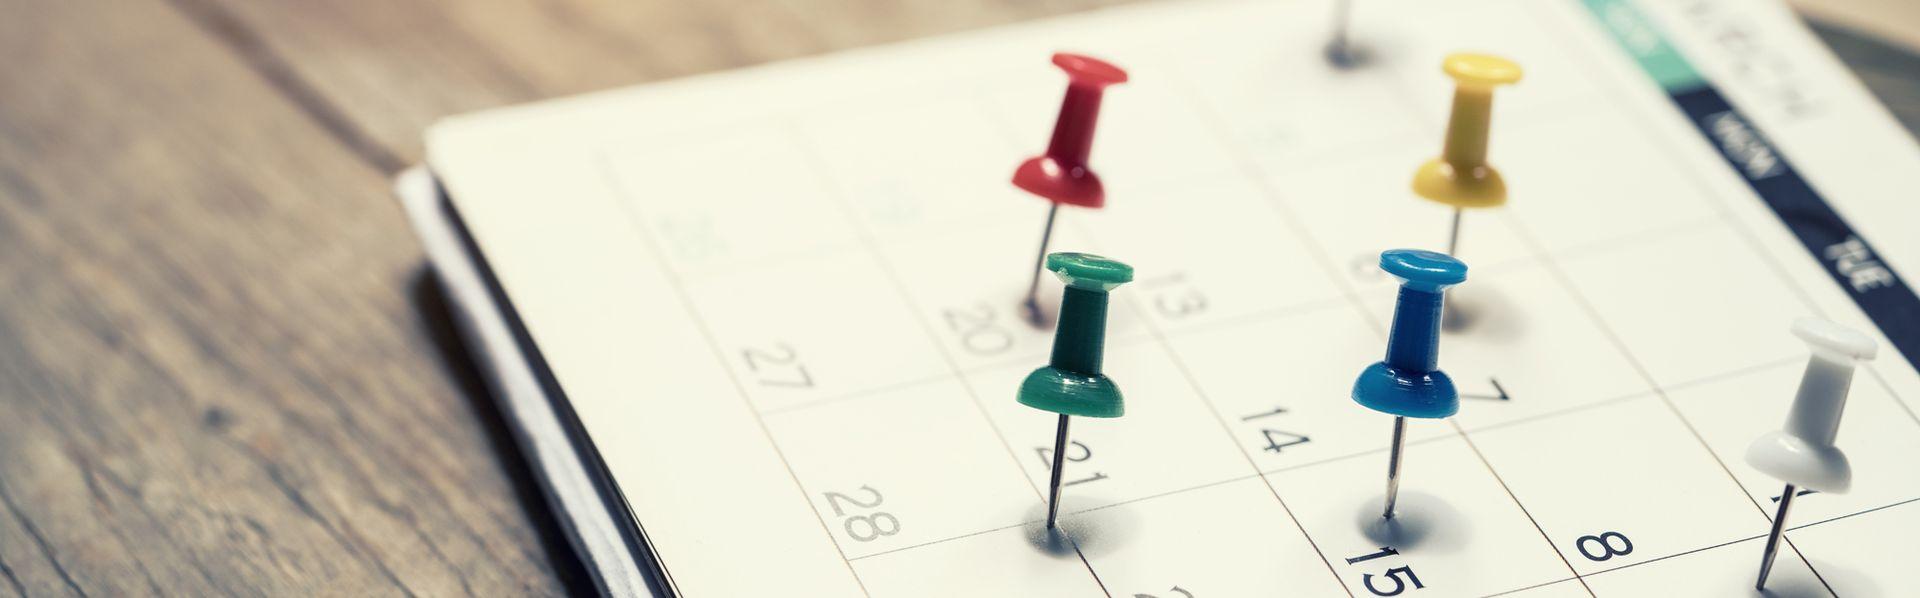 Le calendrier. [tatomm - Fotolia]